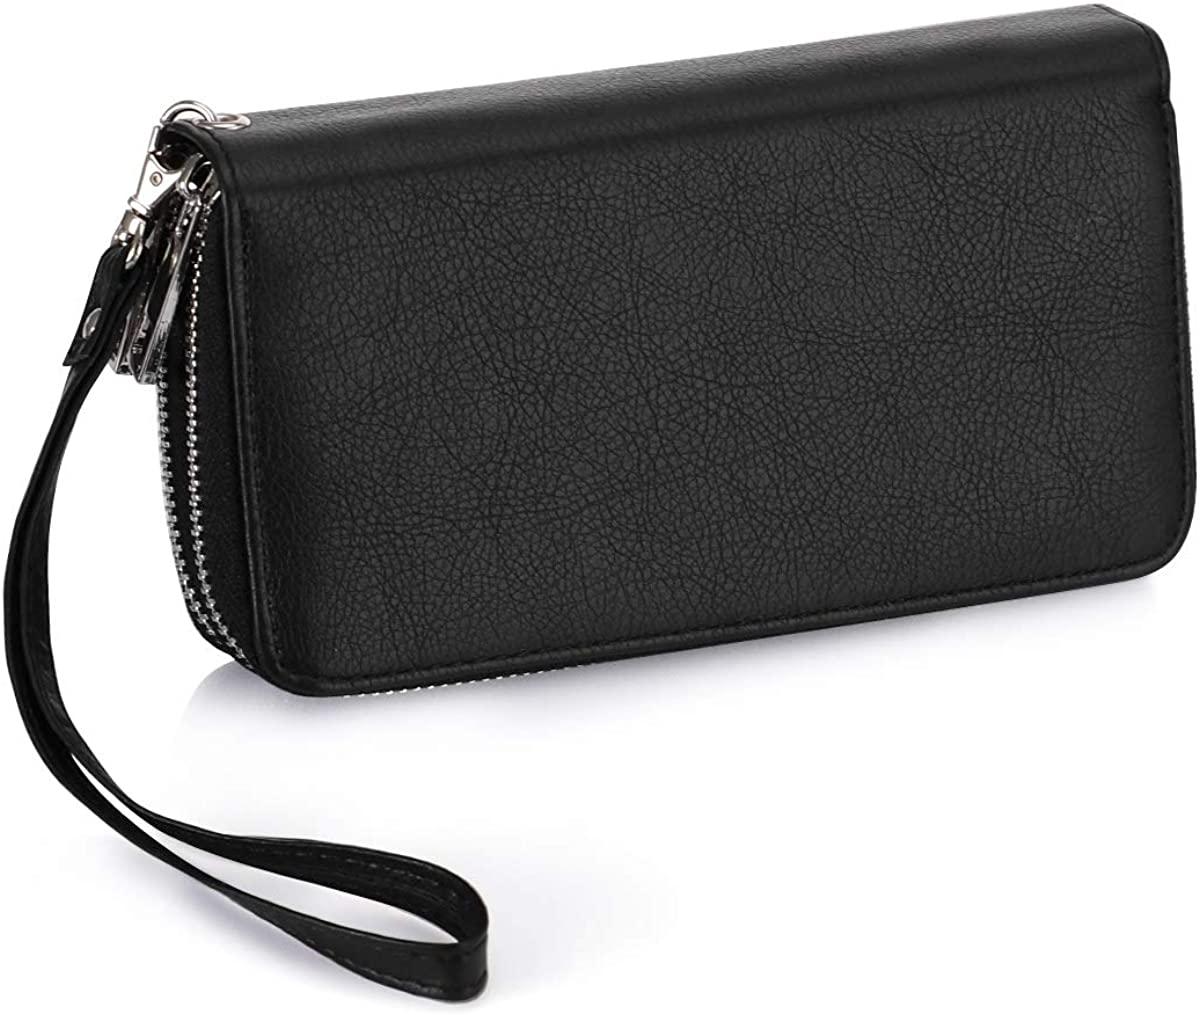 Double Zipper Wristlet Wallet Long Clutch Purse Cellphone Wallet for Women Ladies and Girls